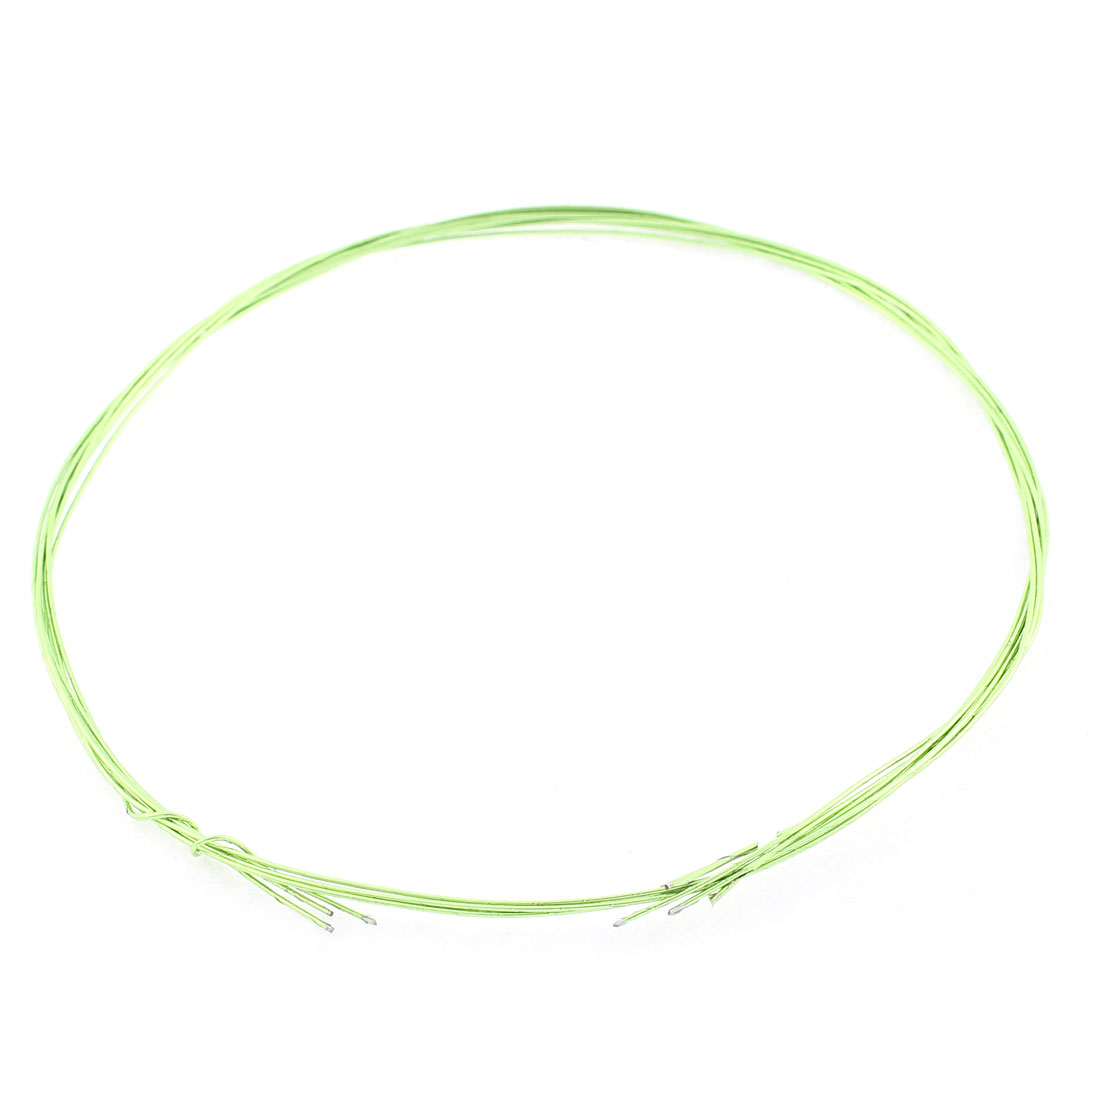 Dress Headdress Flower DIY Craft Jewelry Wire Light Green 1mm Dia 80cm 4 Pcs